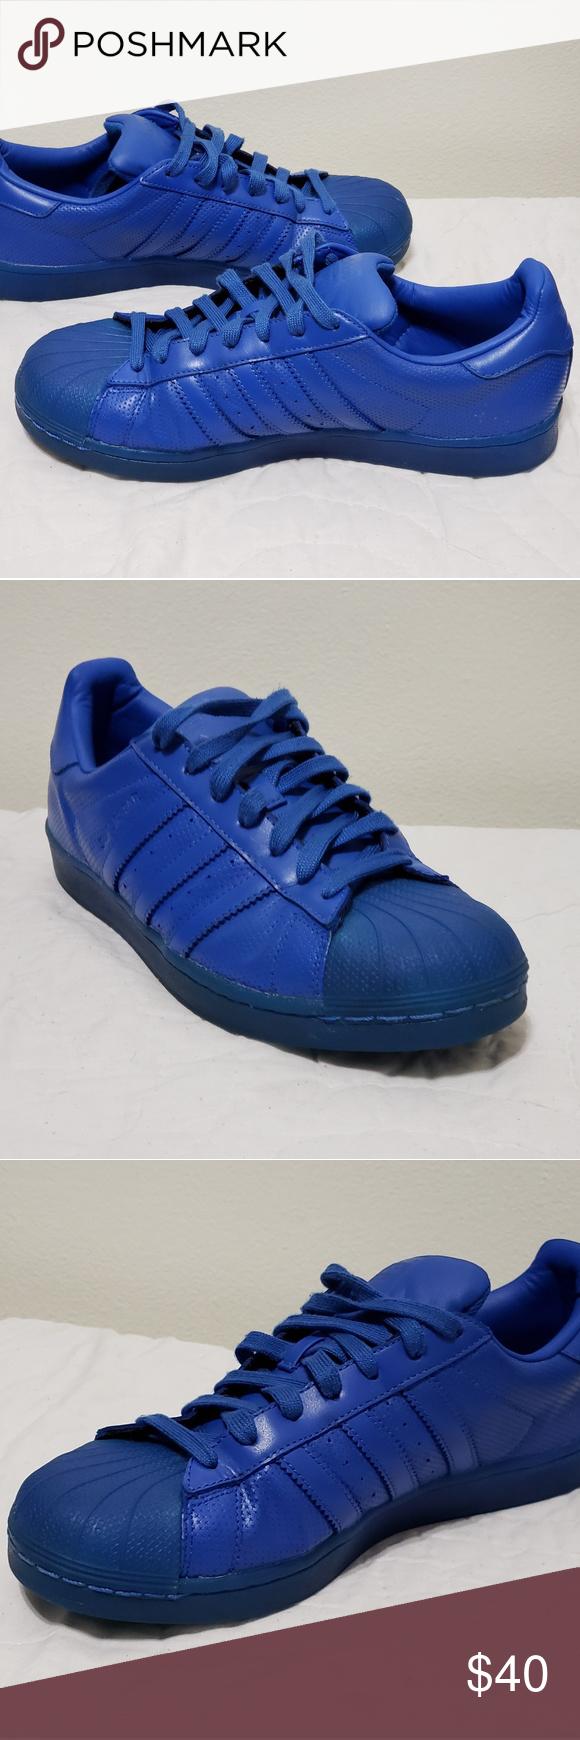 more photos 144ed 67e5f ADIDAS SUPERSTAR TRIPLE BLUE Adidas Superstars AdidaColor ...